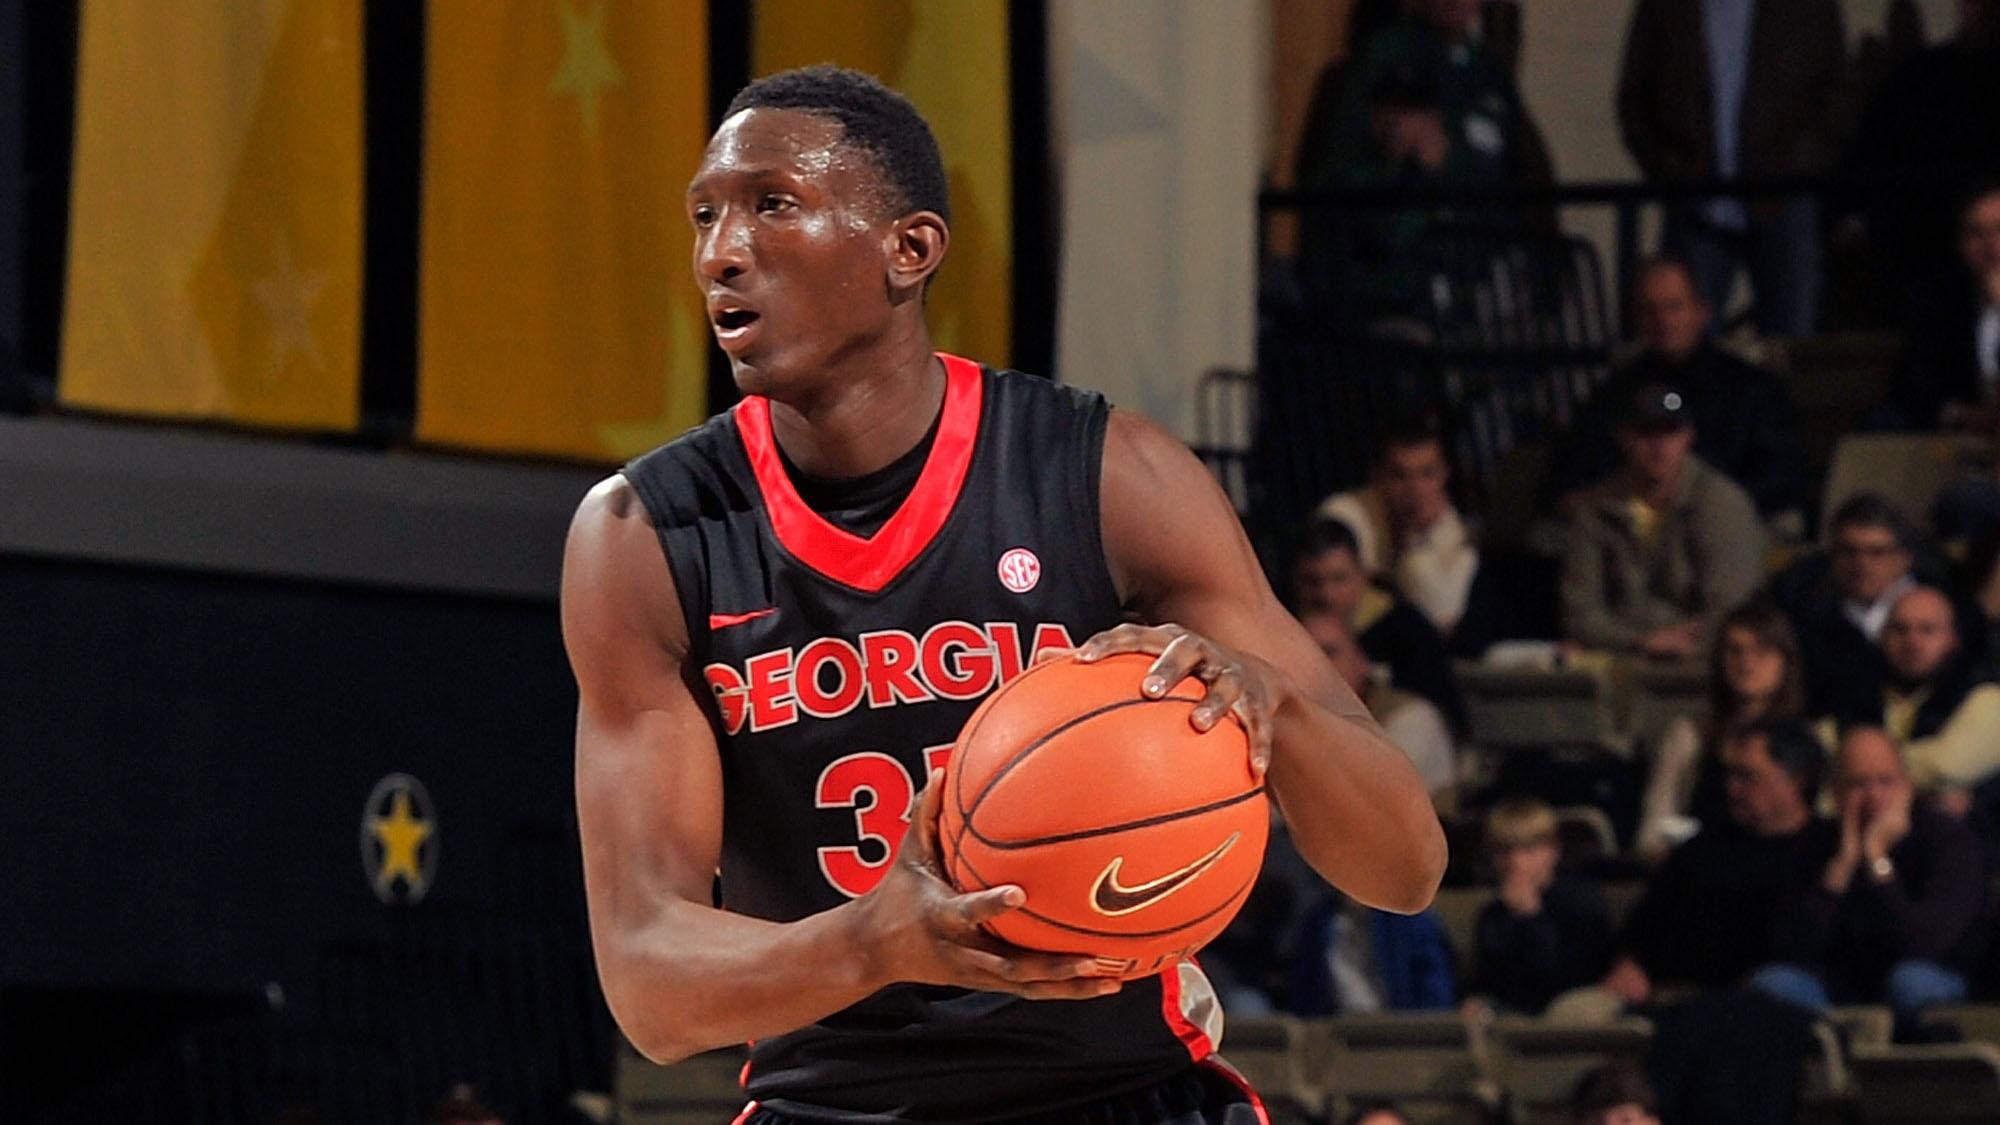 Brandon Morris kicked off Georgia basketball team